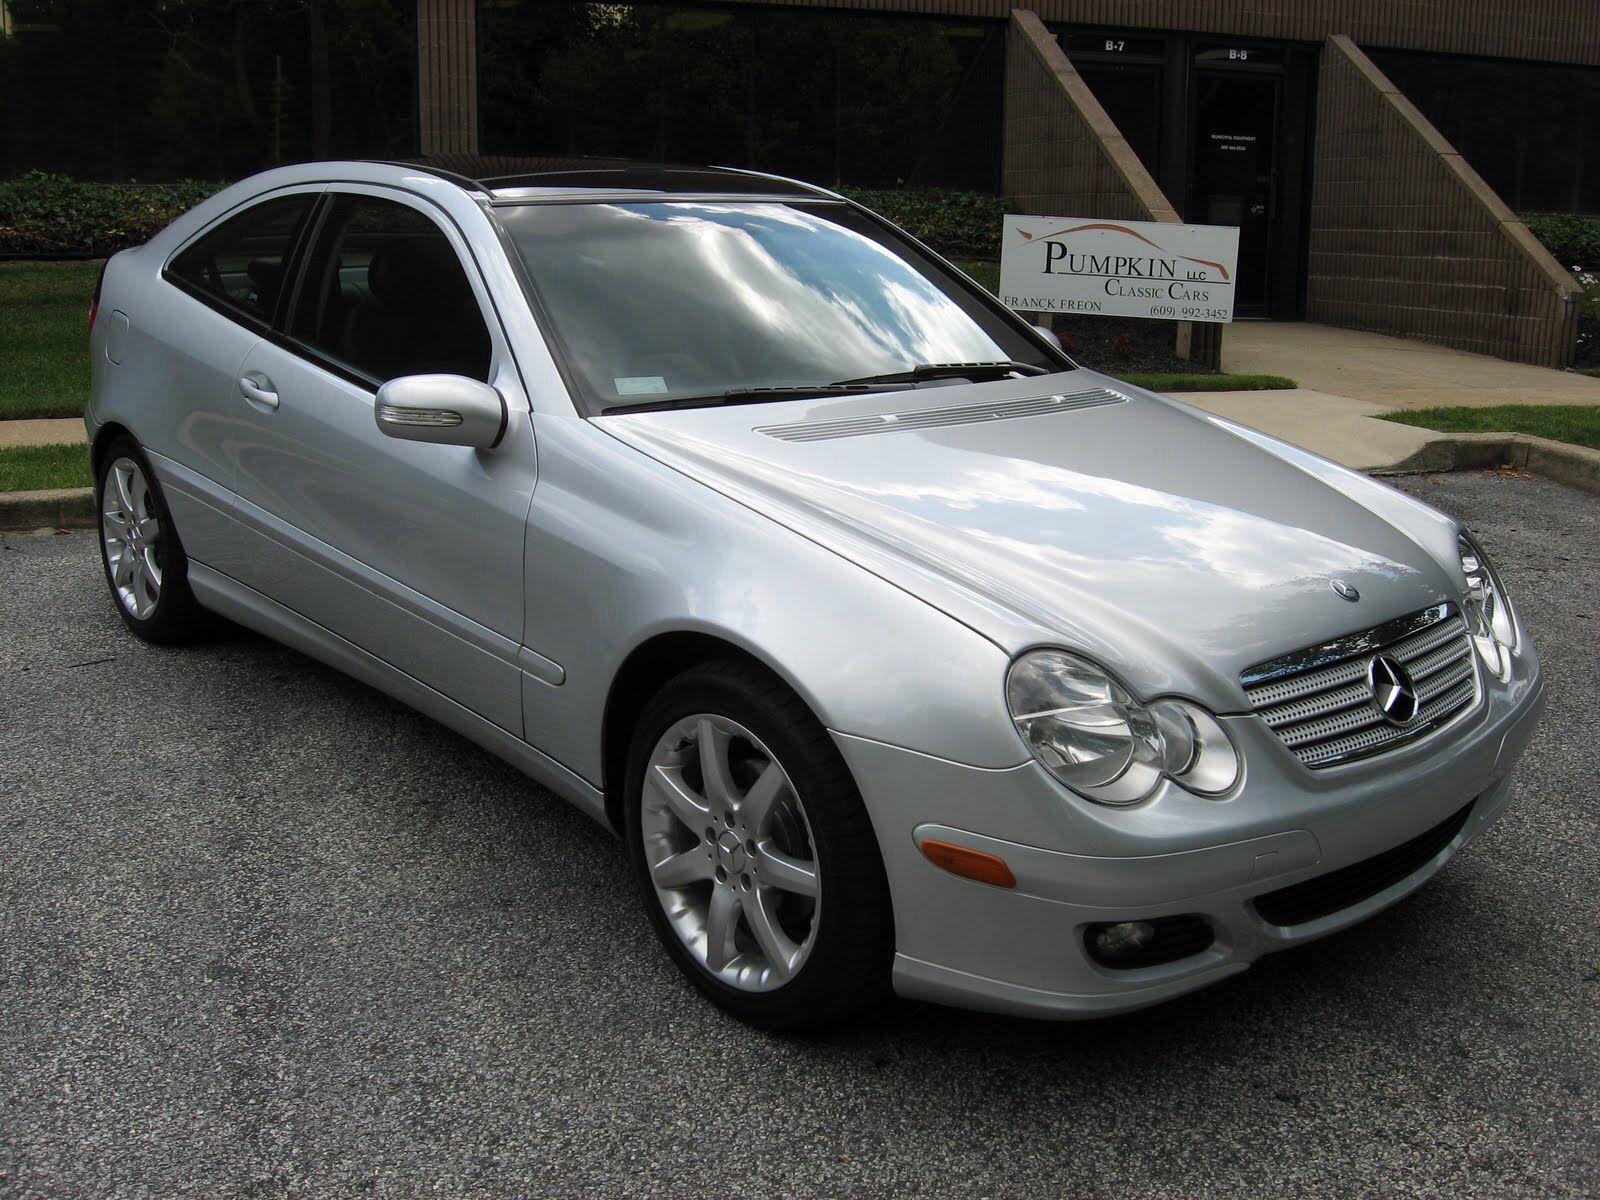 My Dream Car For The Moment 2005 Mercedes Benz C230 Kompressor Coupe Carros